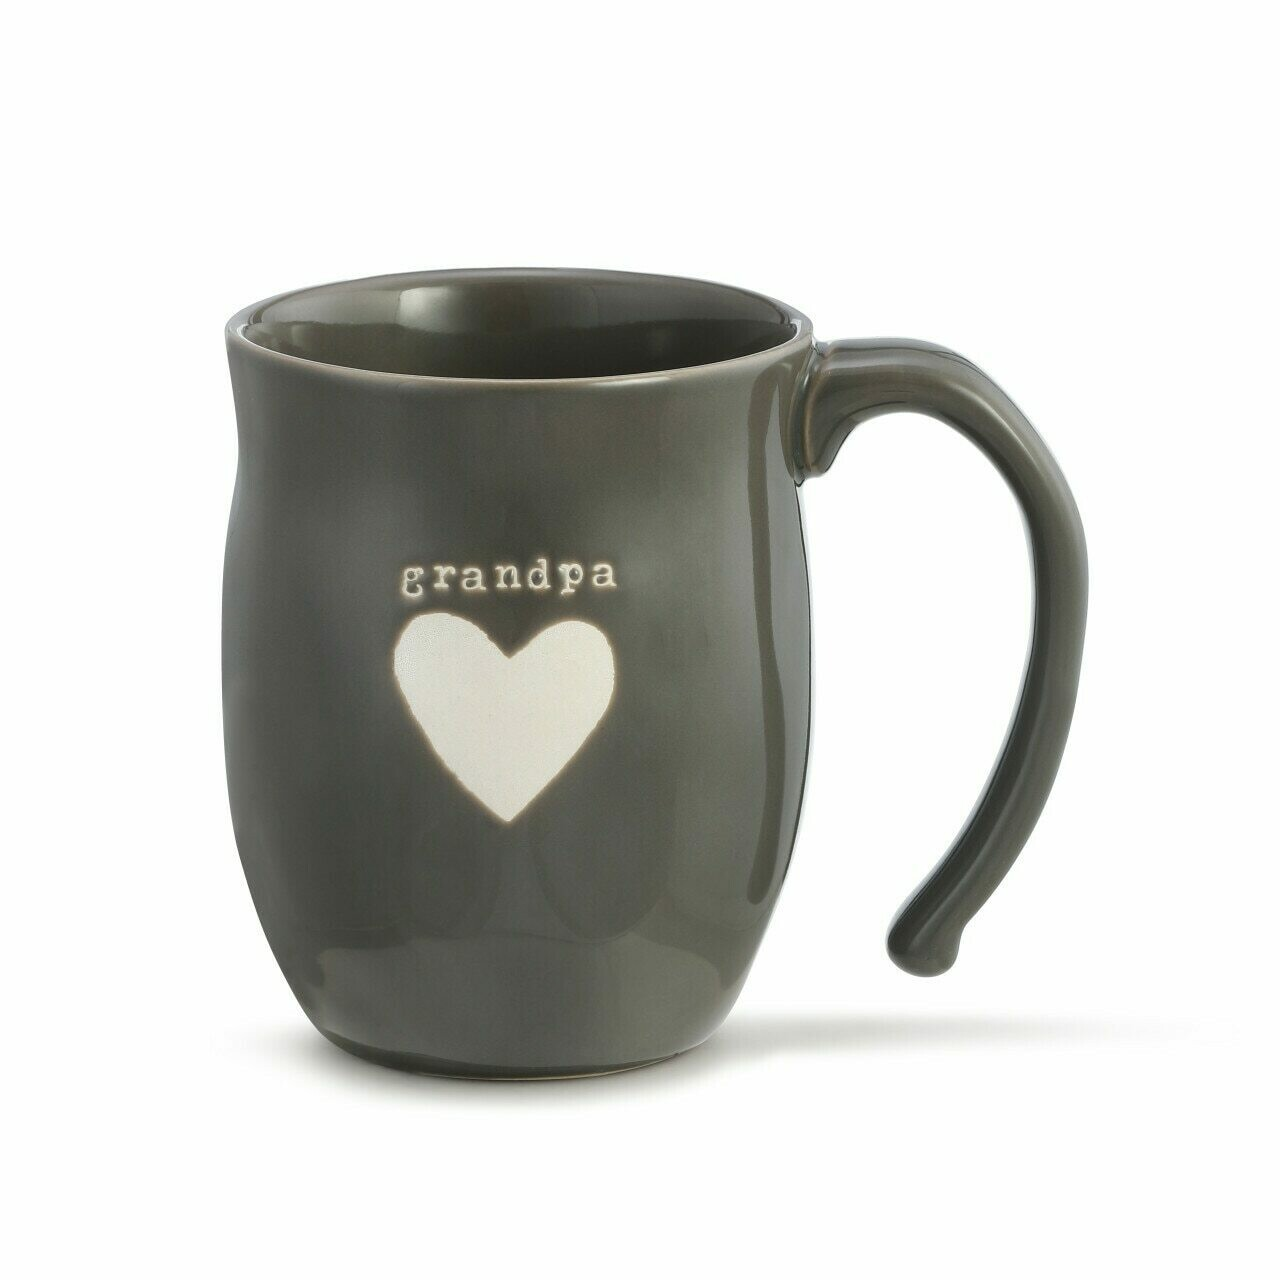 Demdaco Grandpa Heart Mug GRAY